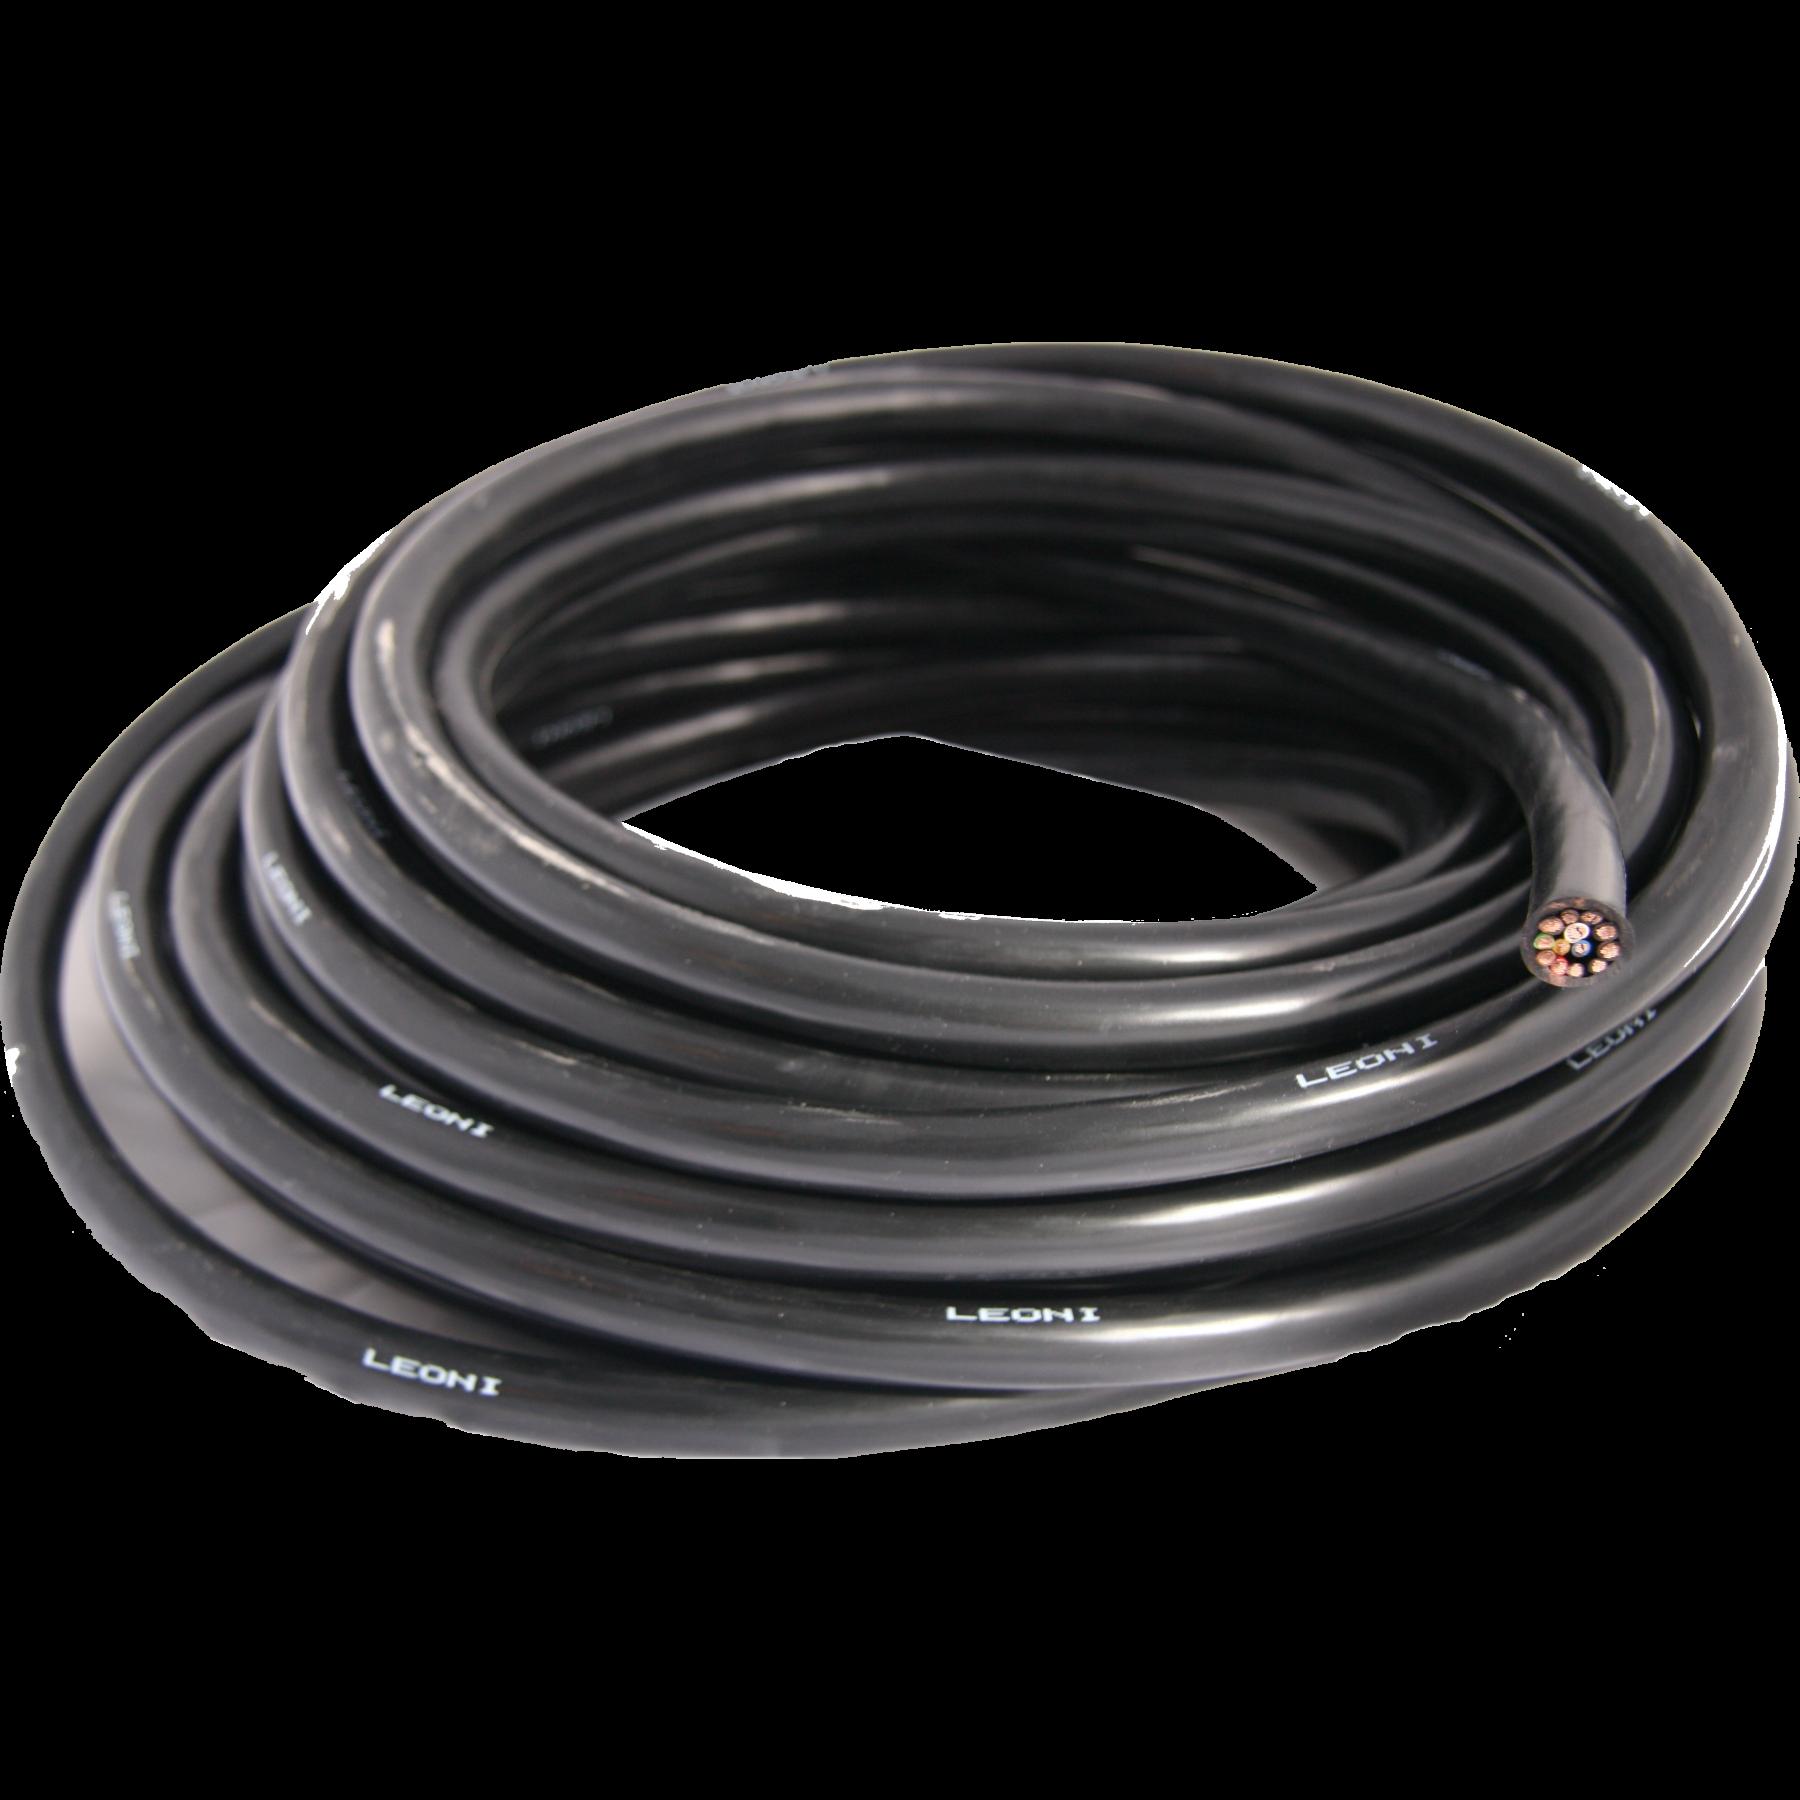 Kabel 13 aderig per meter 9x1,5/4x2,5